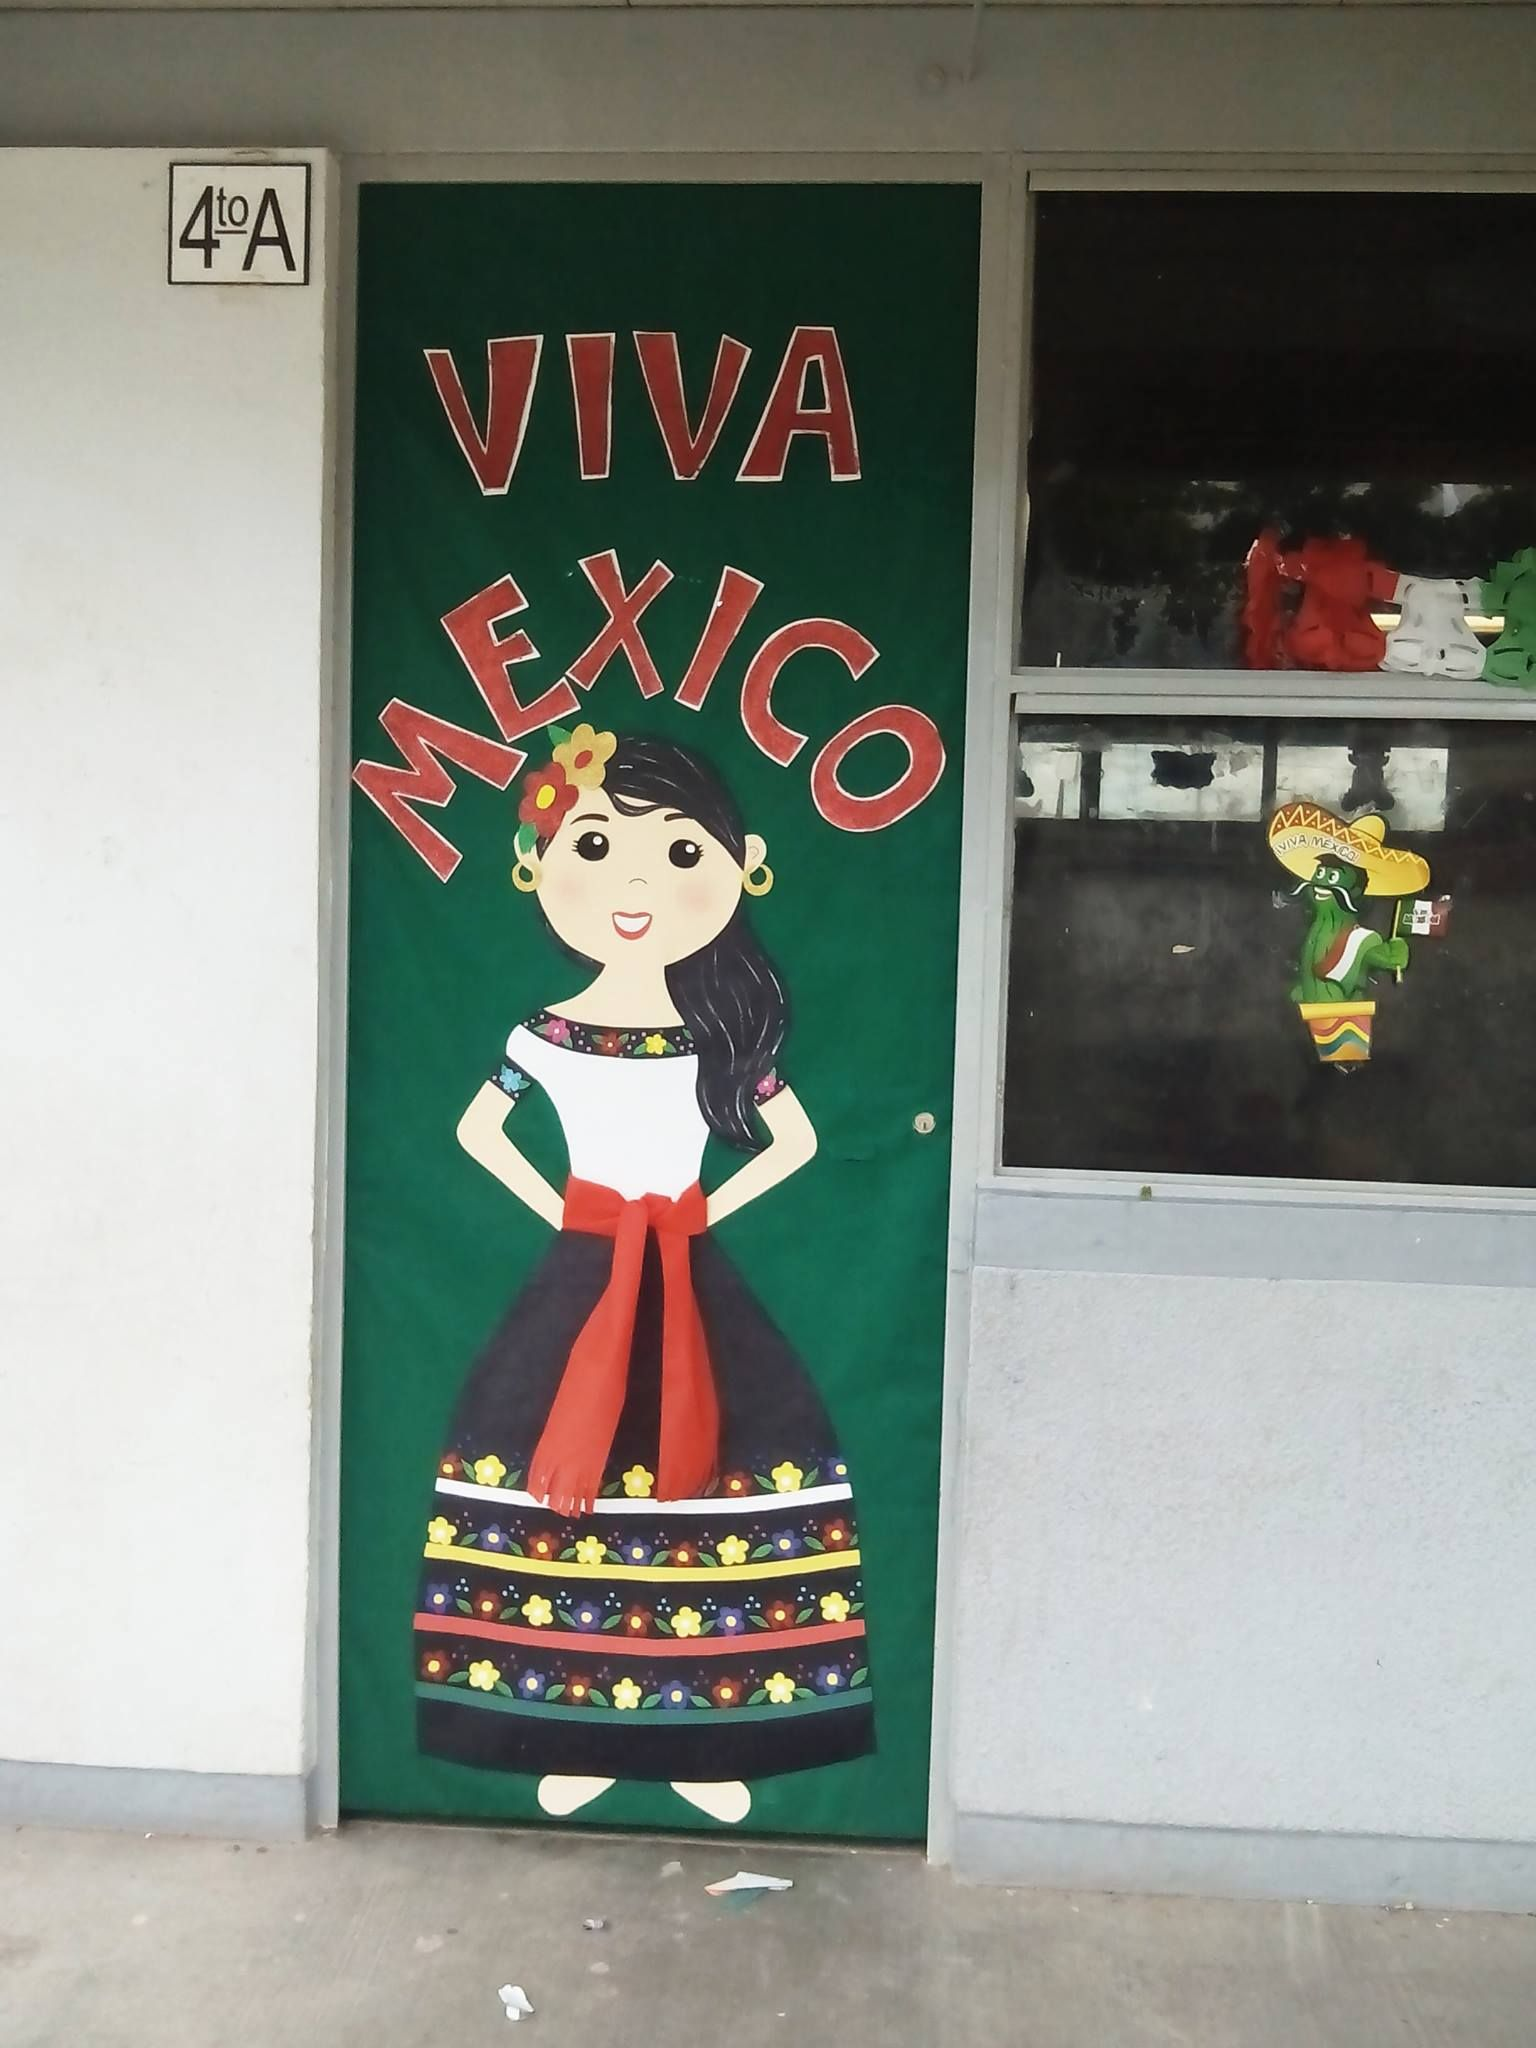 Pin de abriana vzla en mis trabajitos en foami puertas for Puertas decoradas 16 de septiembre